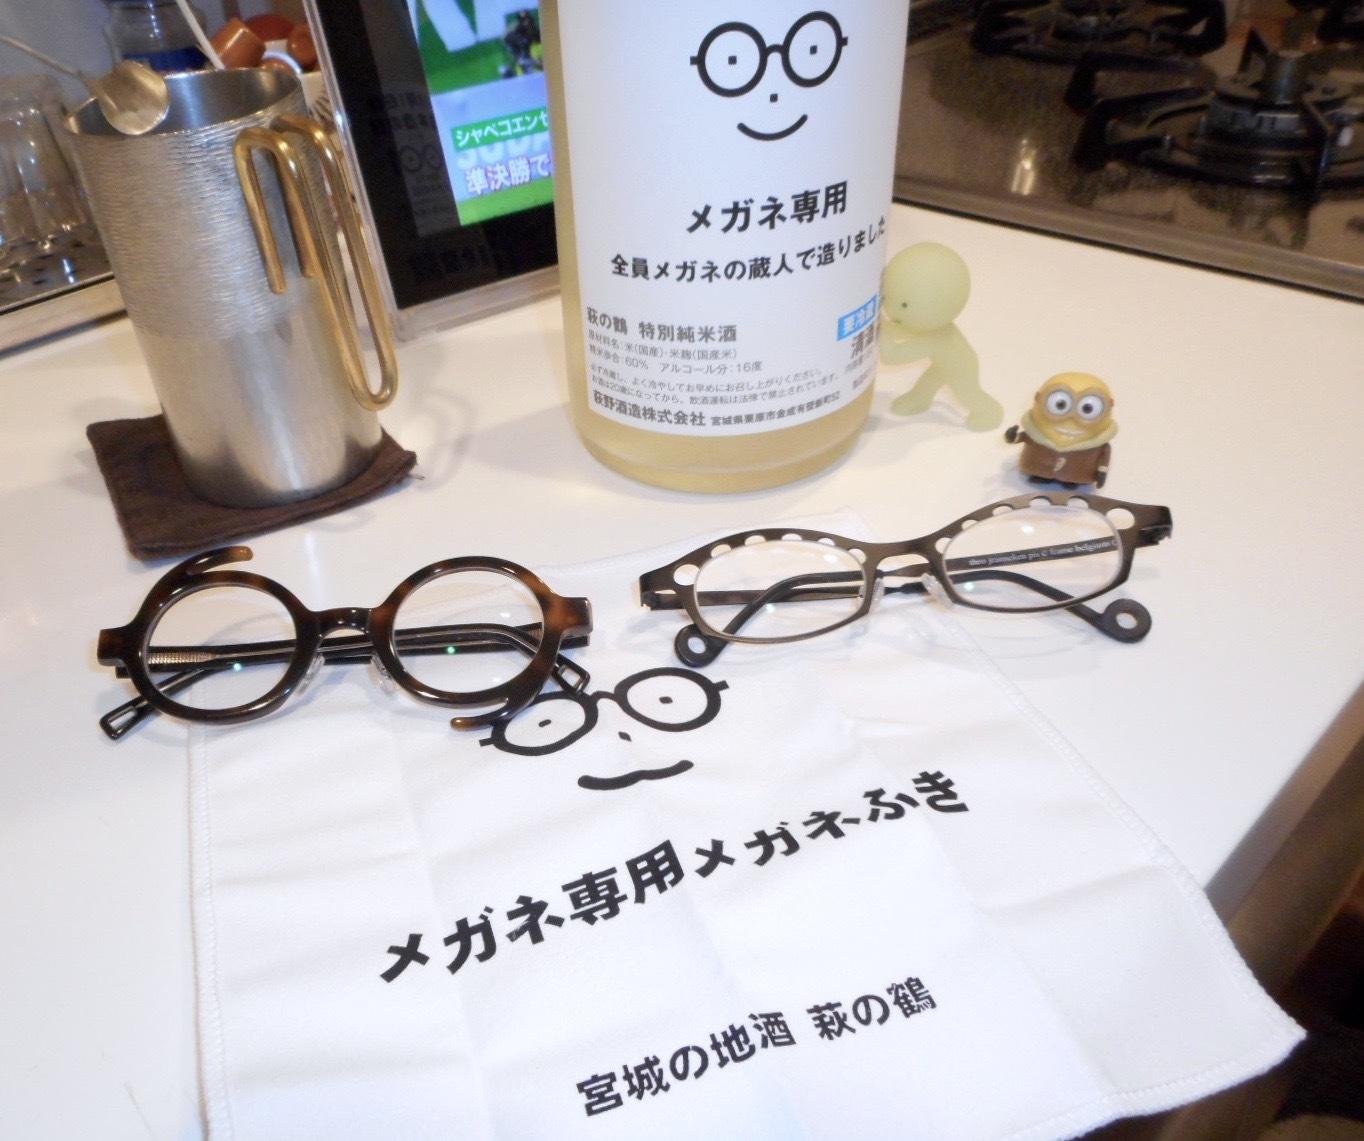 haginotsuru_megane27by7.jpg